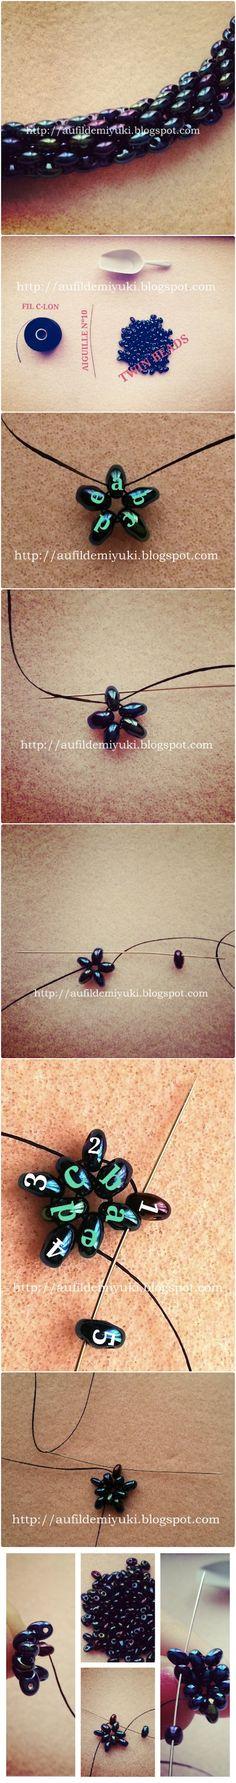 TUTO collier twin beads... version peyote tubulaire - http://aufildemiyuki.blogspot.cz/2013/03/twin-beads-tuto-collier-twin-beads.html